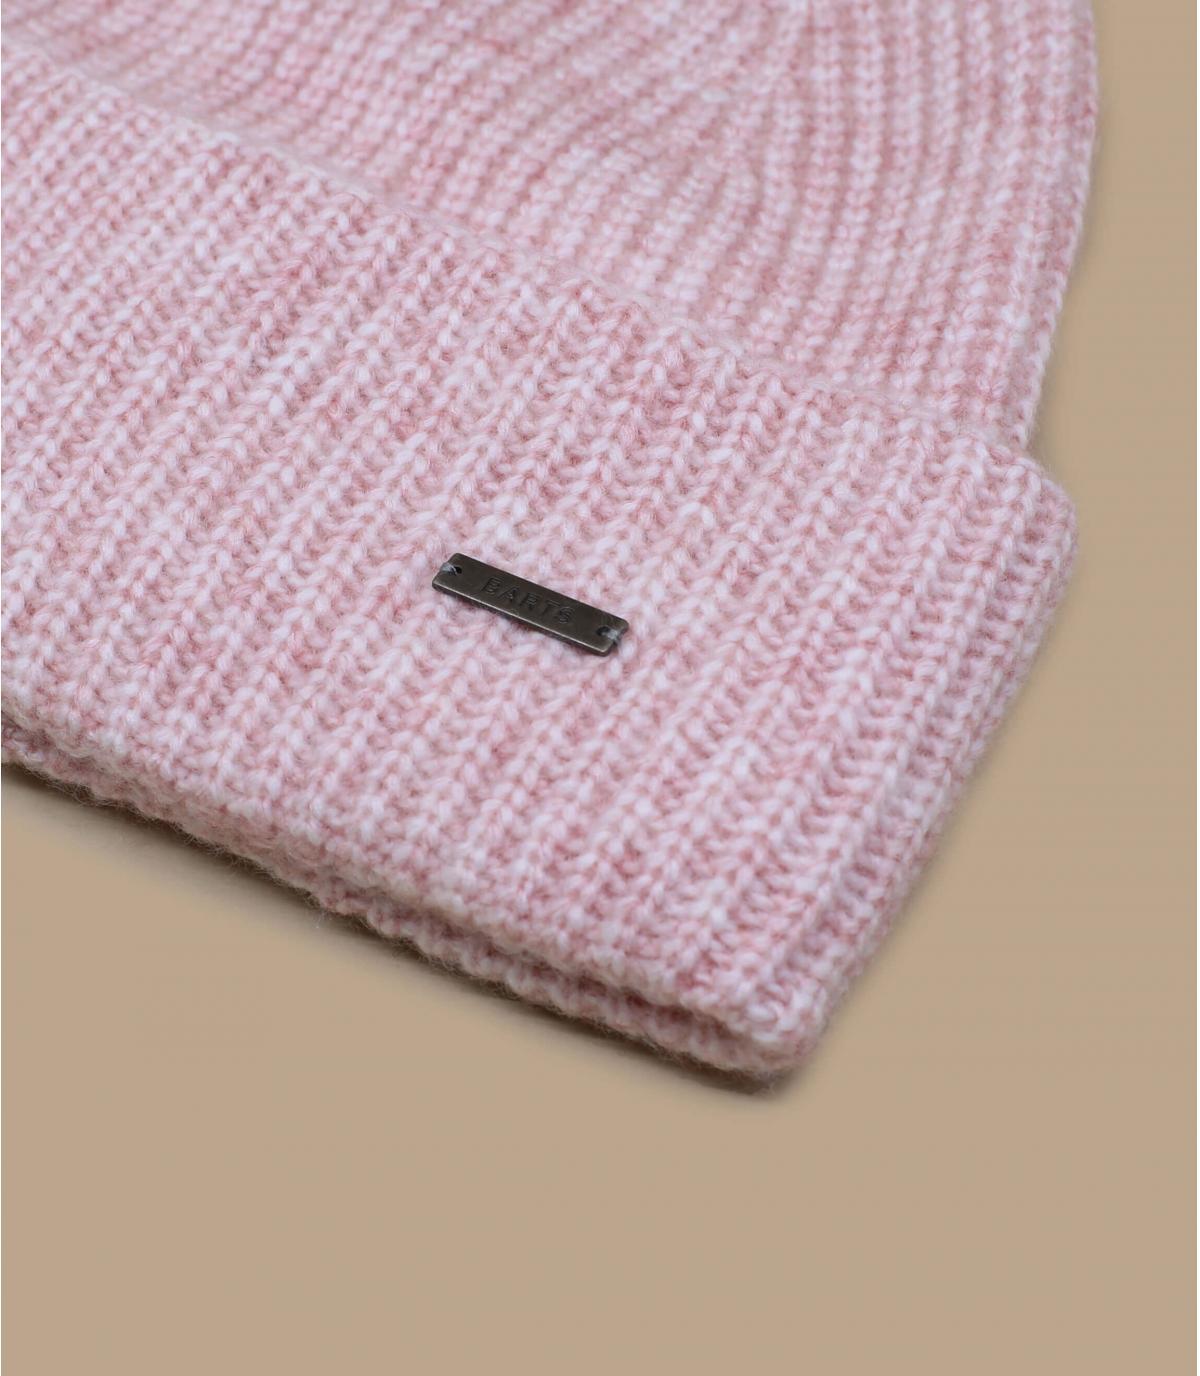 Détails Preeda Beanie pink - image 3